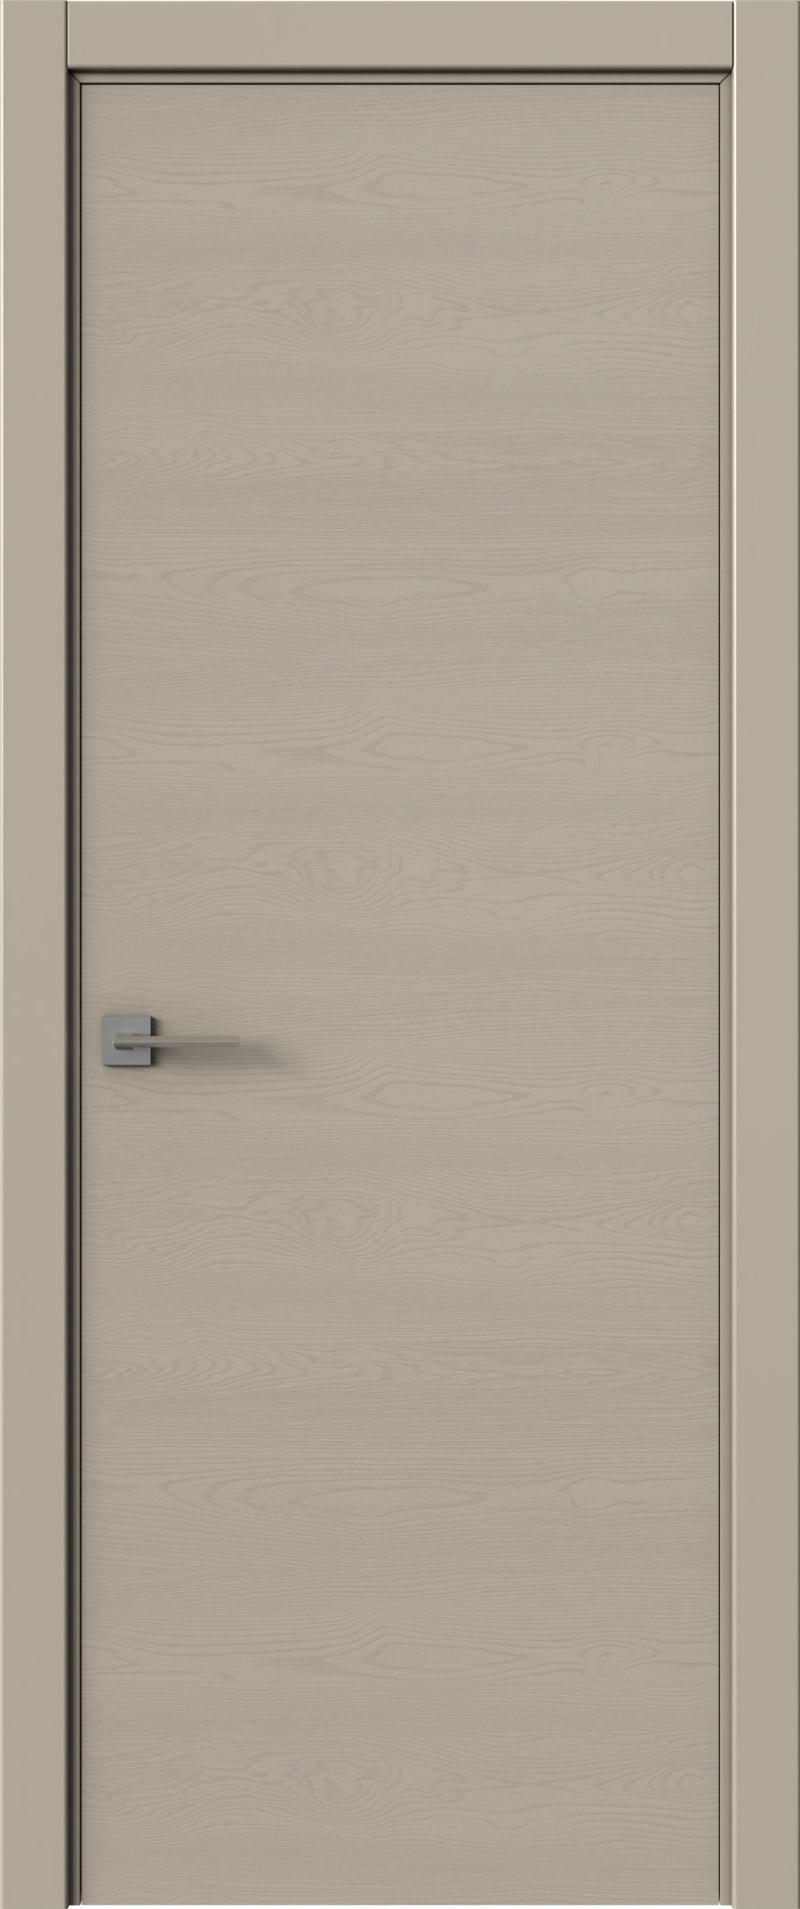 Tivoli А-2 цвет - Серо-оливковая эмаль по шпону (RAL 7032) Без стекла (ДГ)